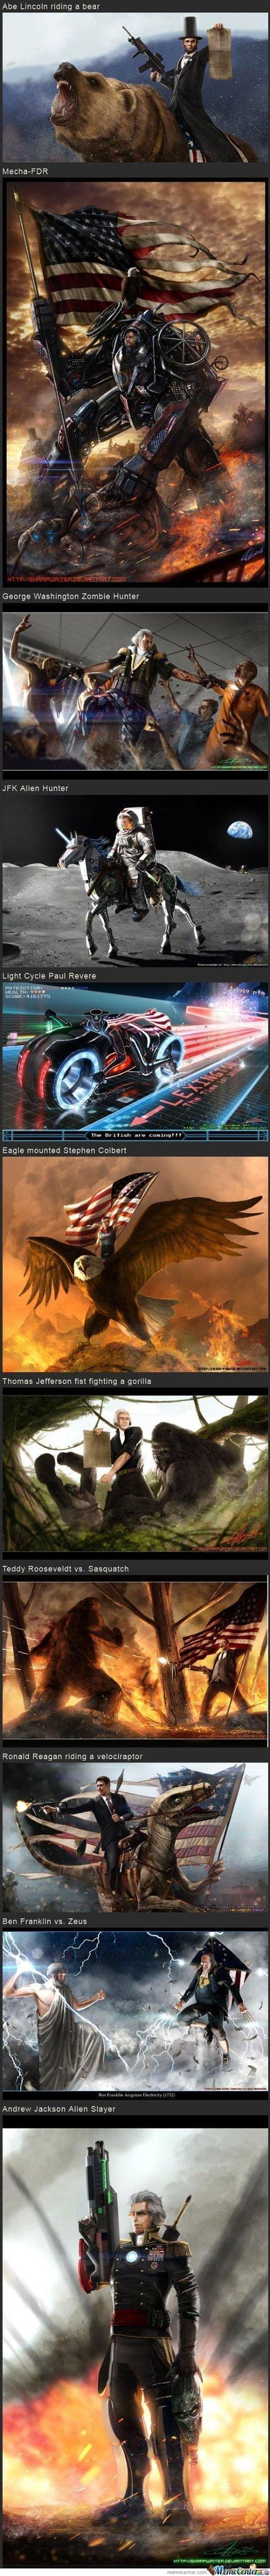 'Murica. FTW. Abe Licoln nando a new Mrk' JFK Allen Hunter Eagle mounted Stephen comm Teddy Roosevelt vs Sasquatch. Chewbaca riding a squirrel fighting nazis...